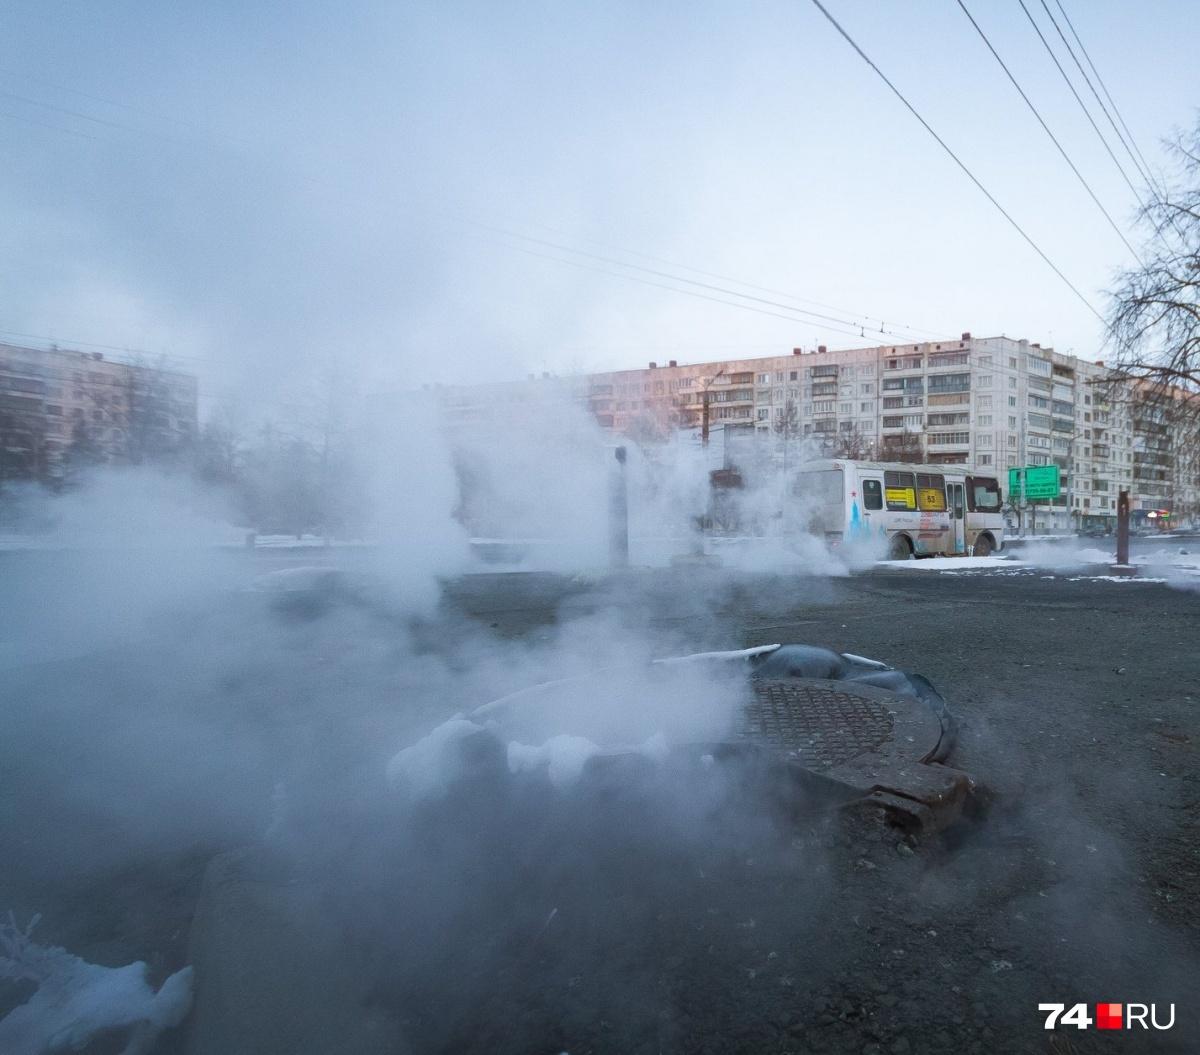 Из-за ремонта сетей жители оставались без тепла неоднократно